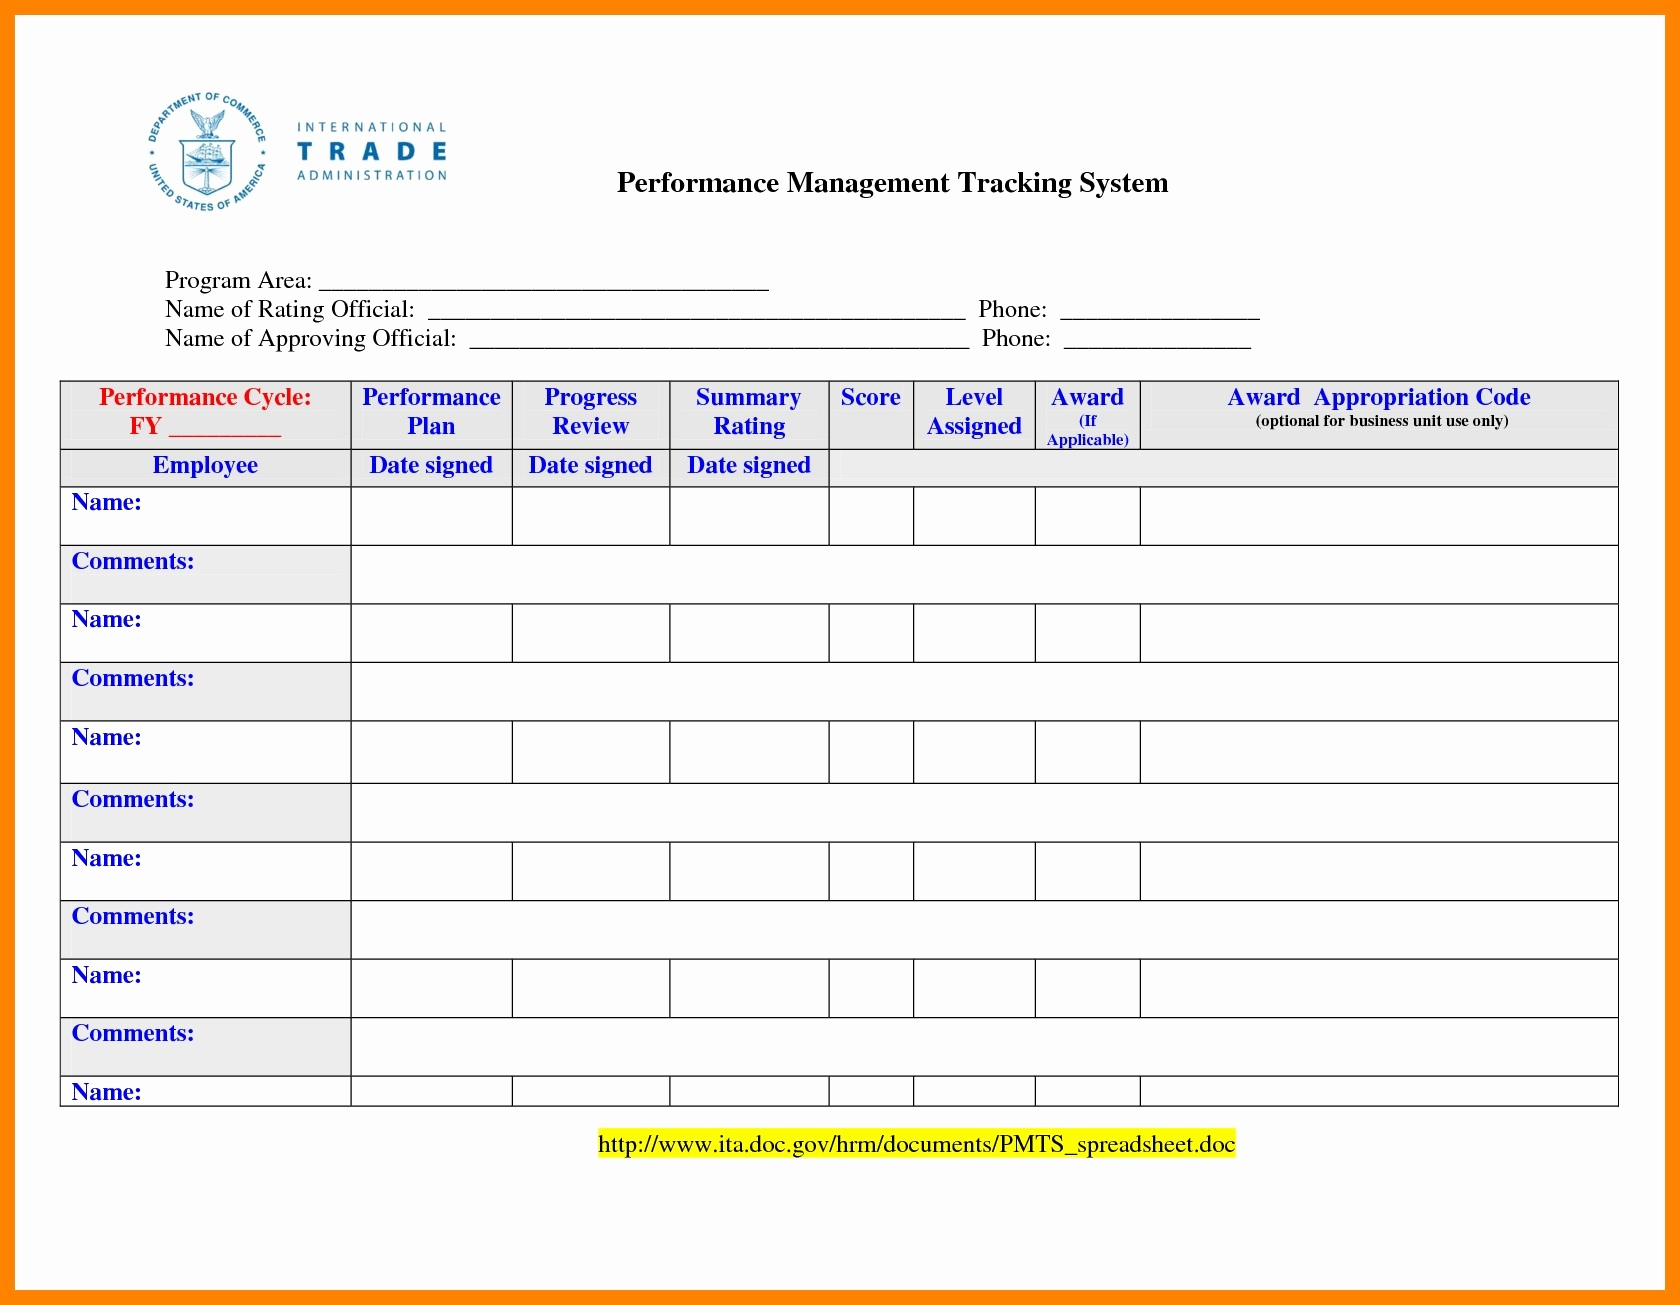 Employee Performance Tracking Spreadsheet Intended For How To Track Employee Performance Spreadsheet As Free Spreadsheet